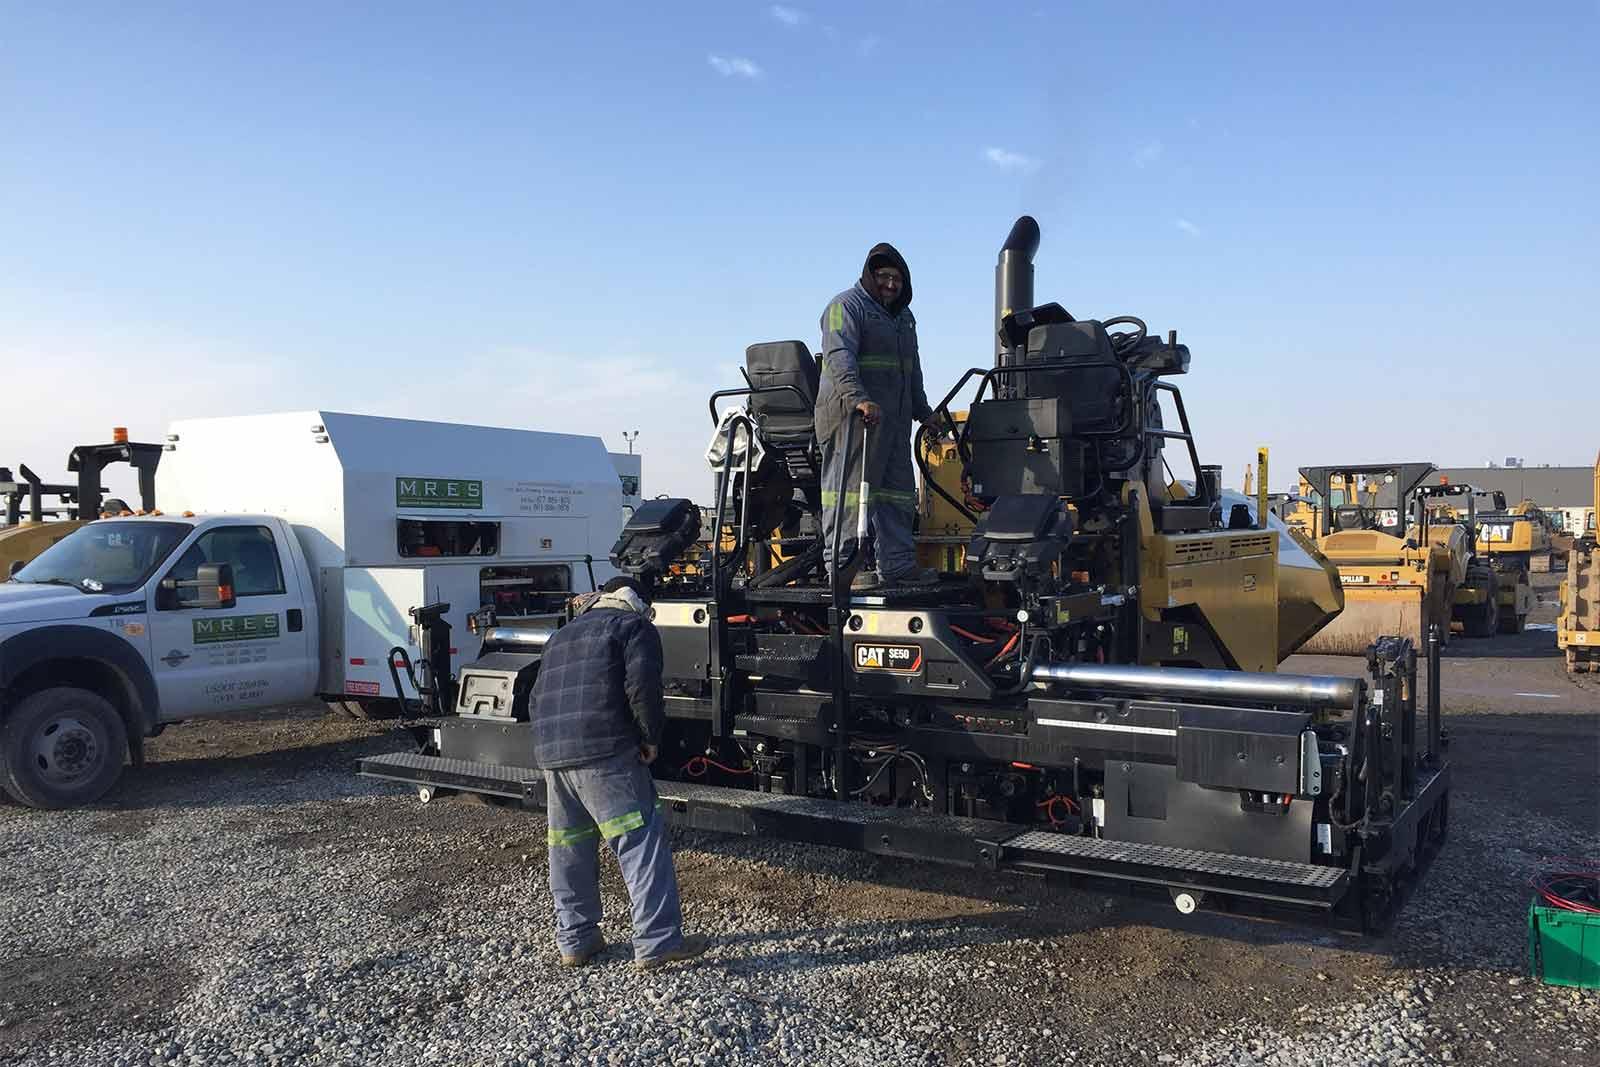 UAPA-Mountain-Regional-Equipment